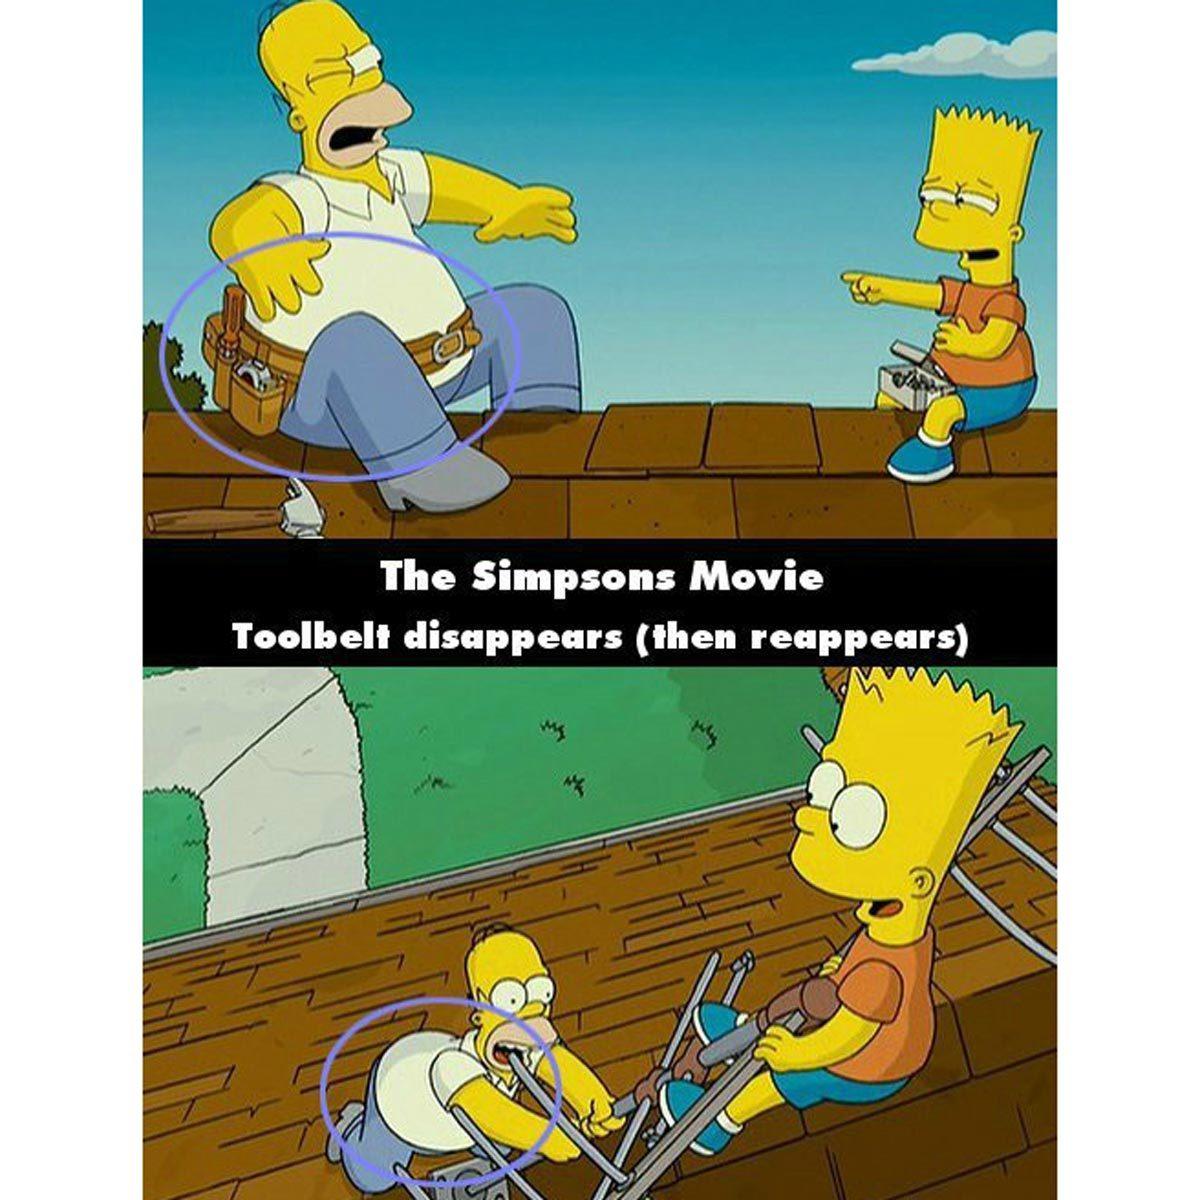 chimage simpsons movie mistakes